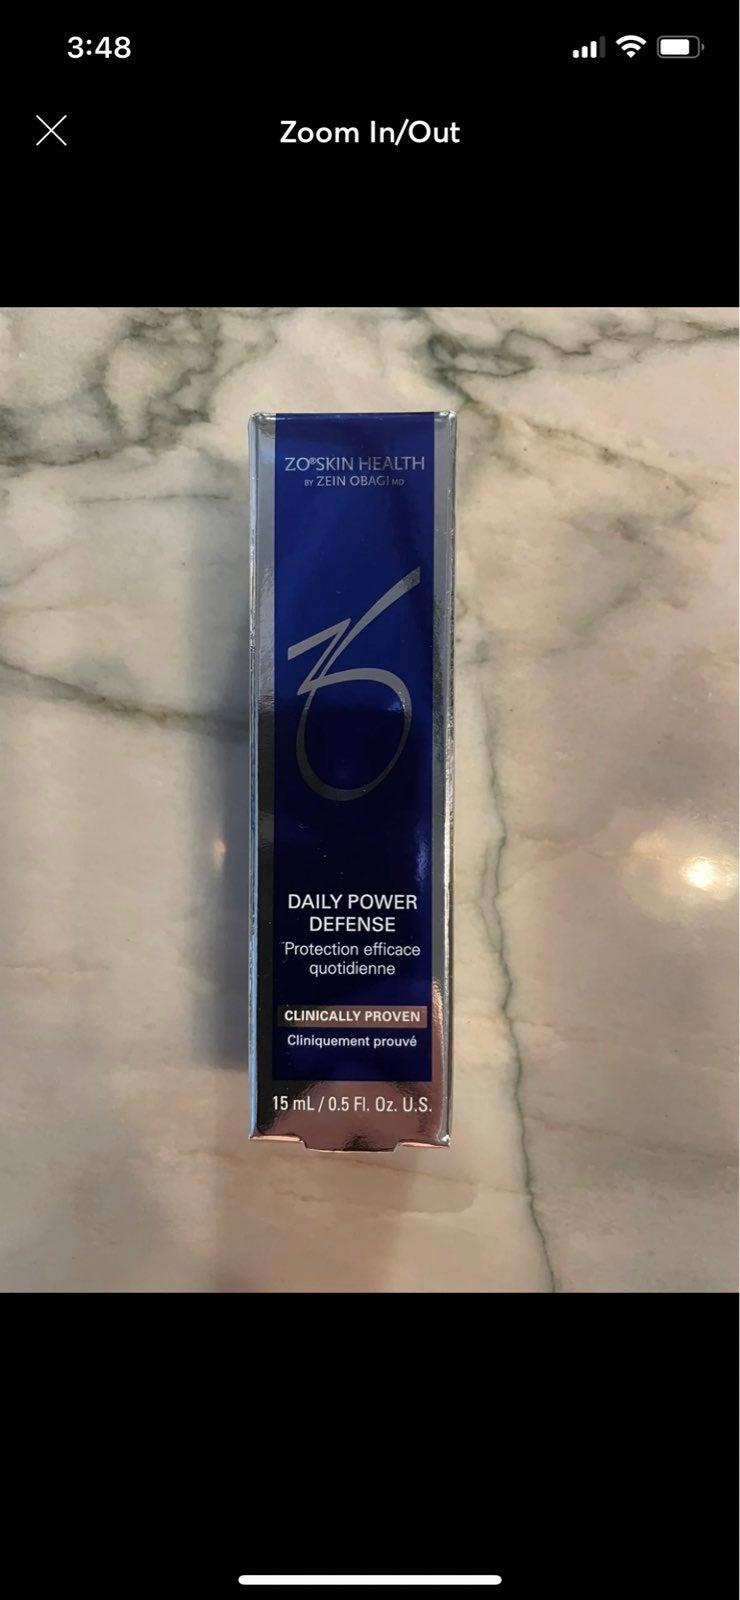 (2) ZO Skin health daily power defense